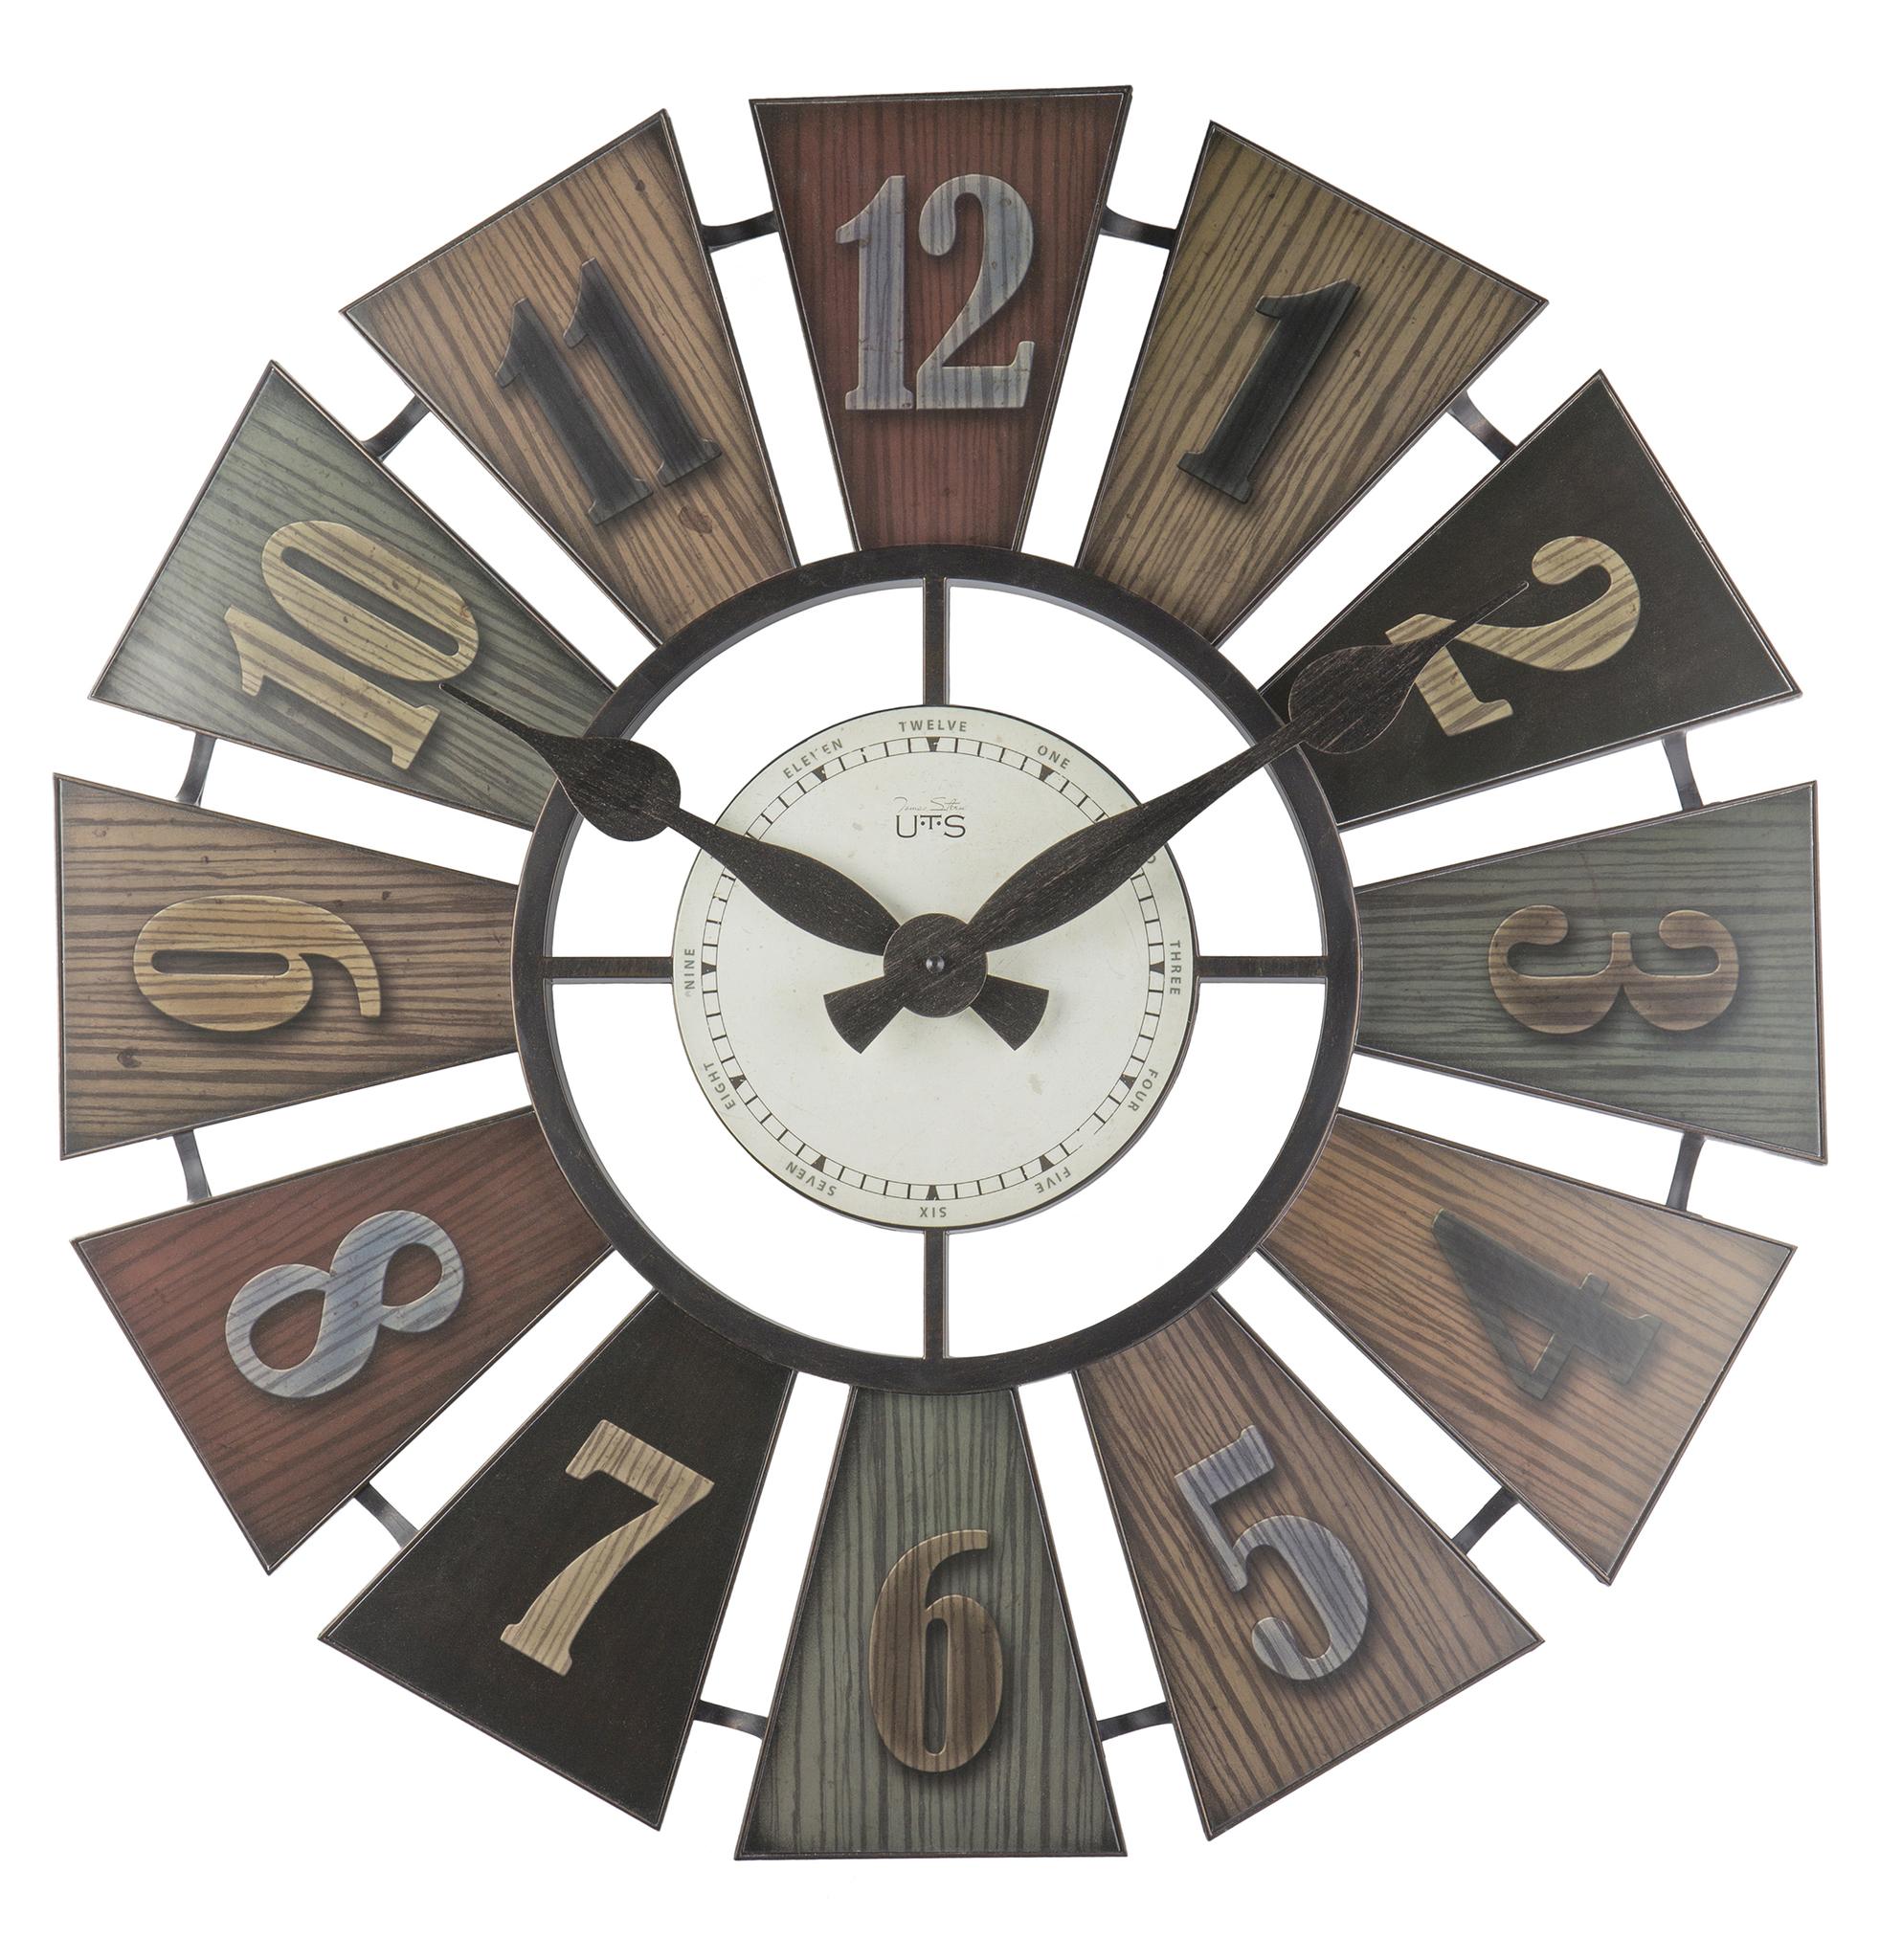 Часы настенные Часы настенные Tomas Stern 9045 chasy-nastennye-tomas-stern-9045-germaniya.jpg